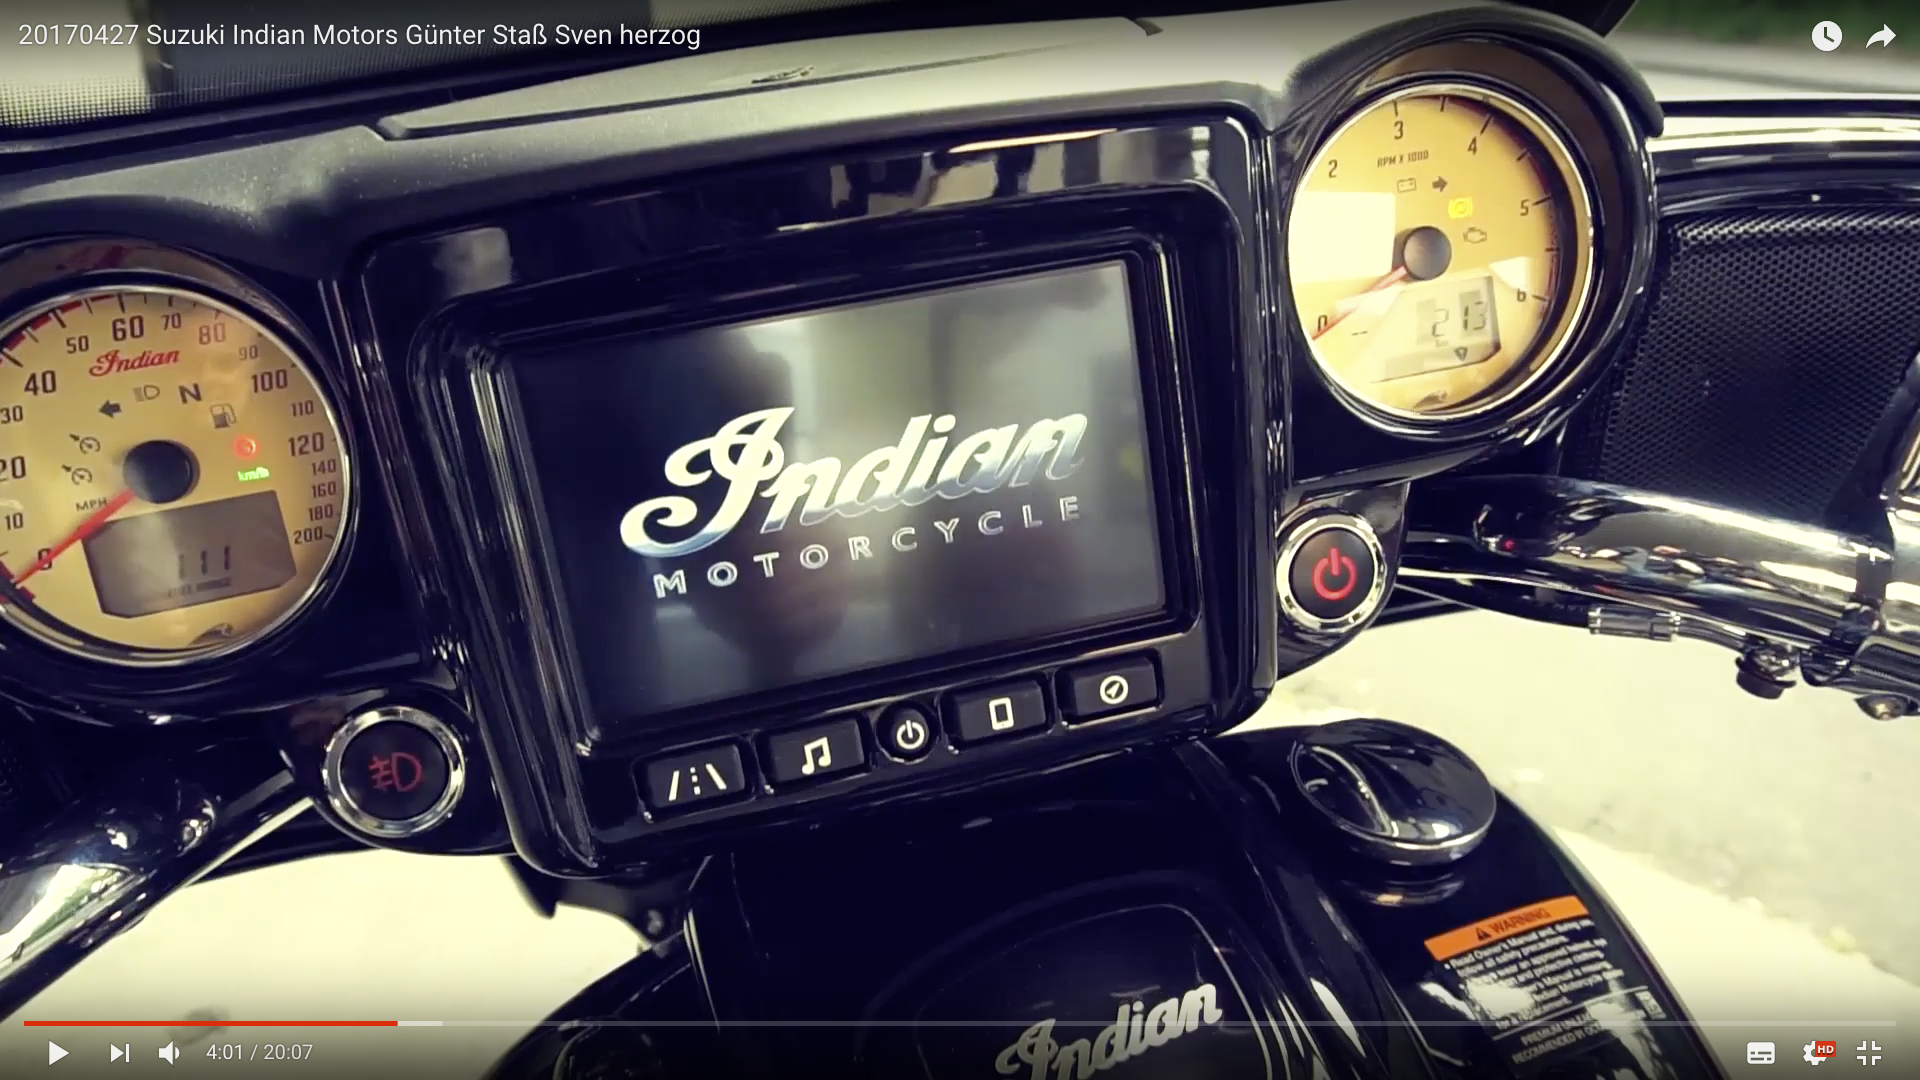 2017 Suzuki Indian Motors Moderne Technik_MSM_MEDIEN_SAAR_MOSEL_SAARLAND_FERNSEHEN_1_ED_SAAR